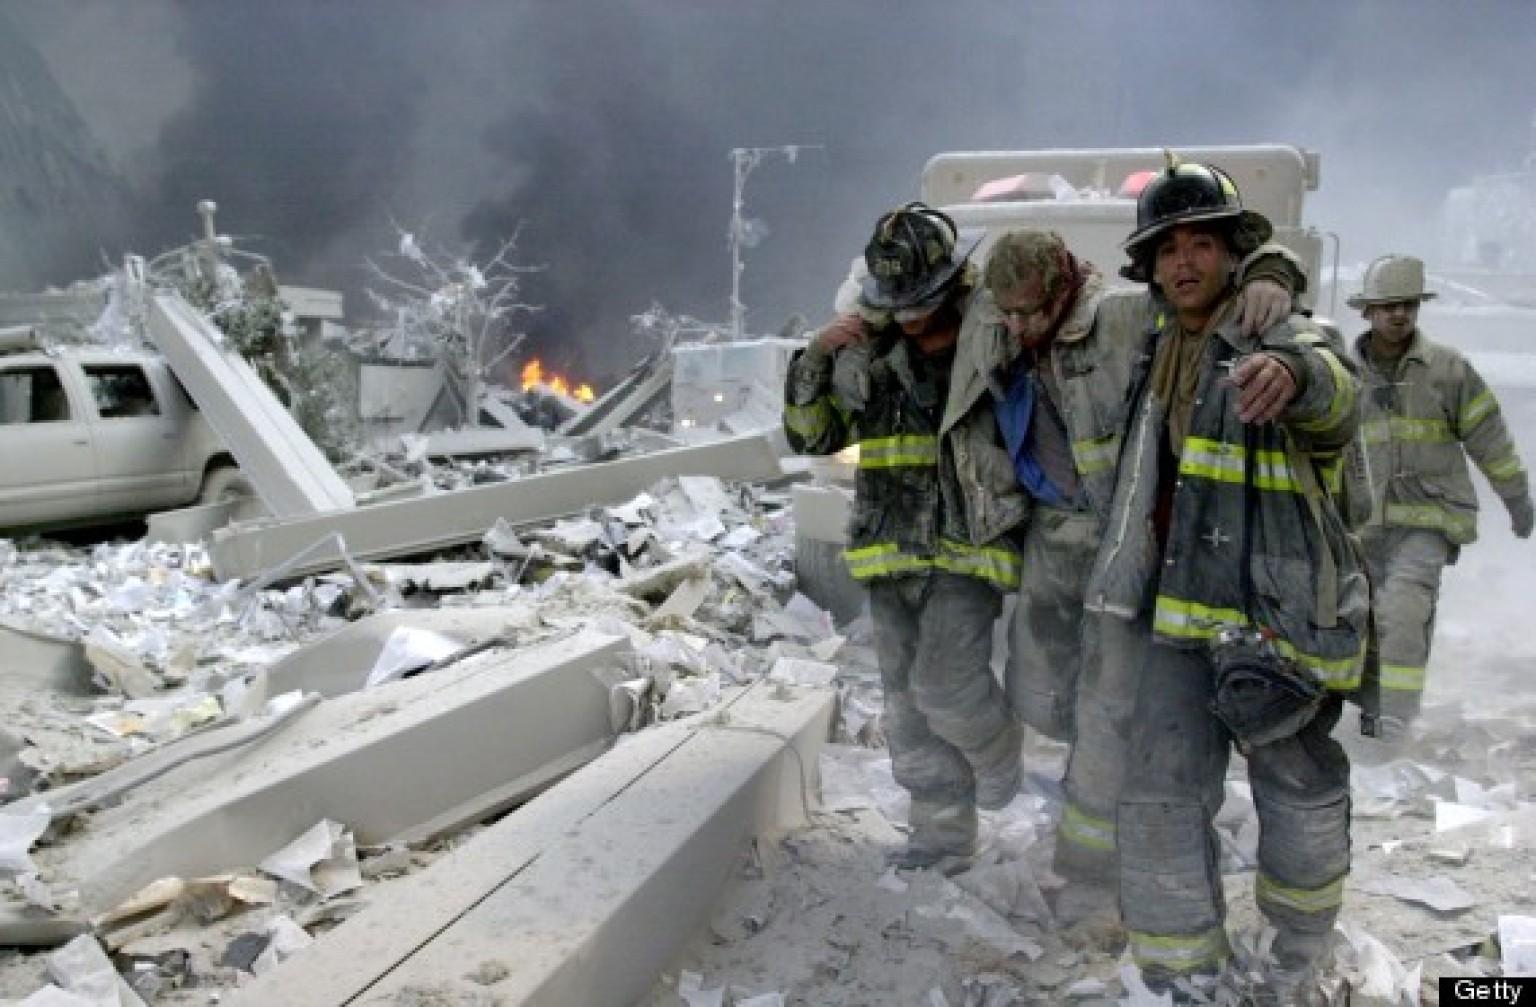 Image result for David handschuh; images; wounded; 911